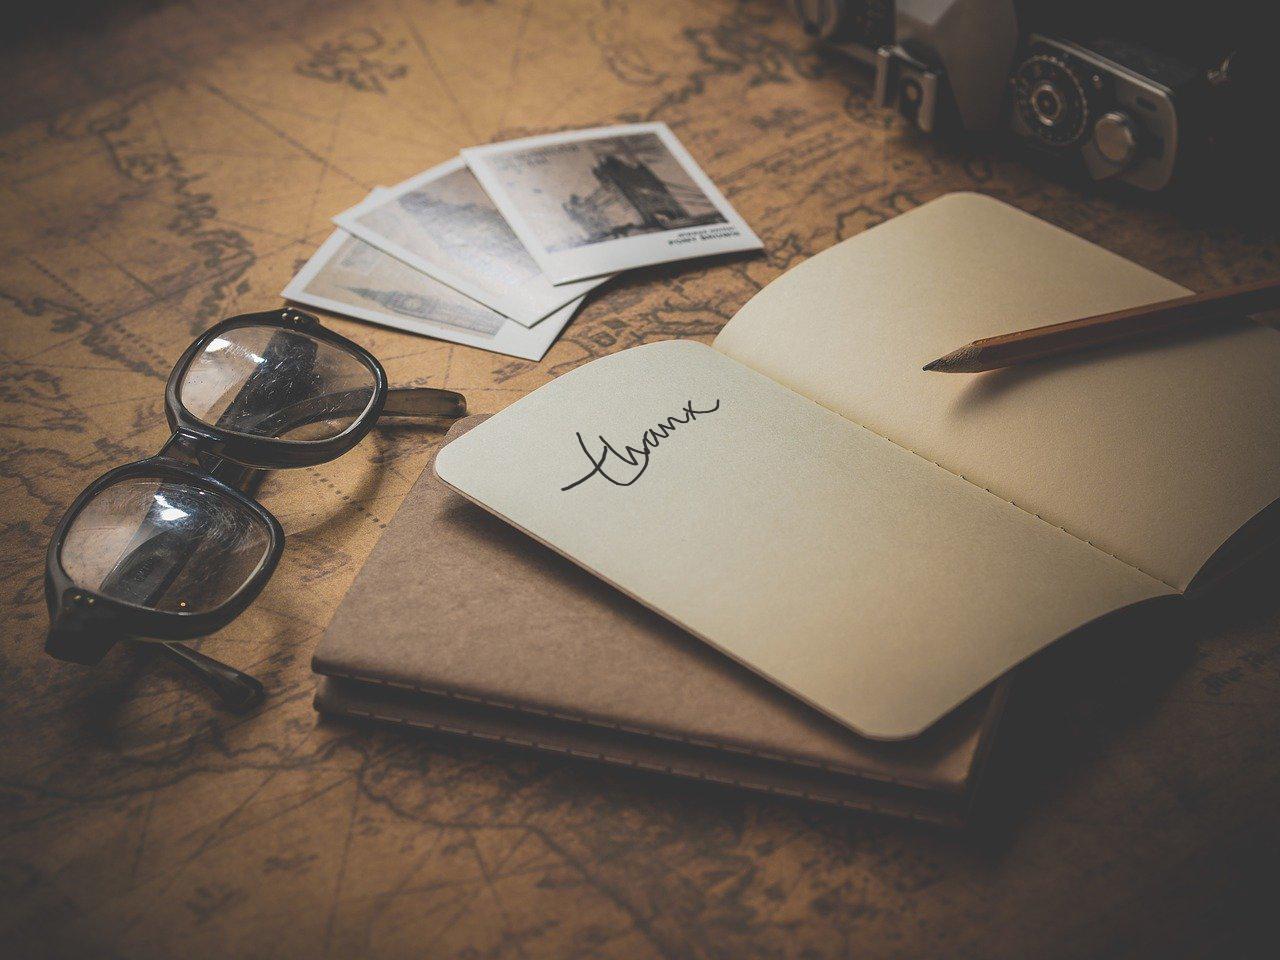 BEdankt briefje, testimonial Workshop poseren kun je leren